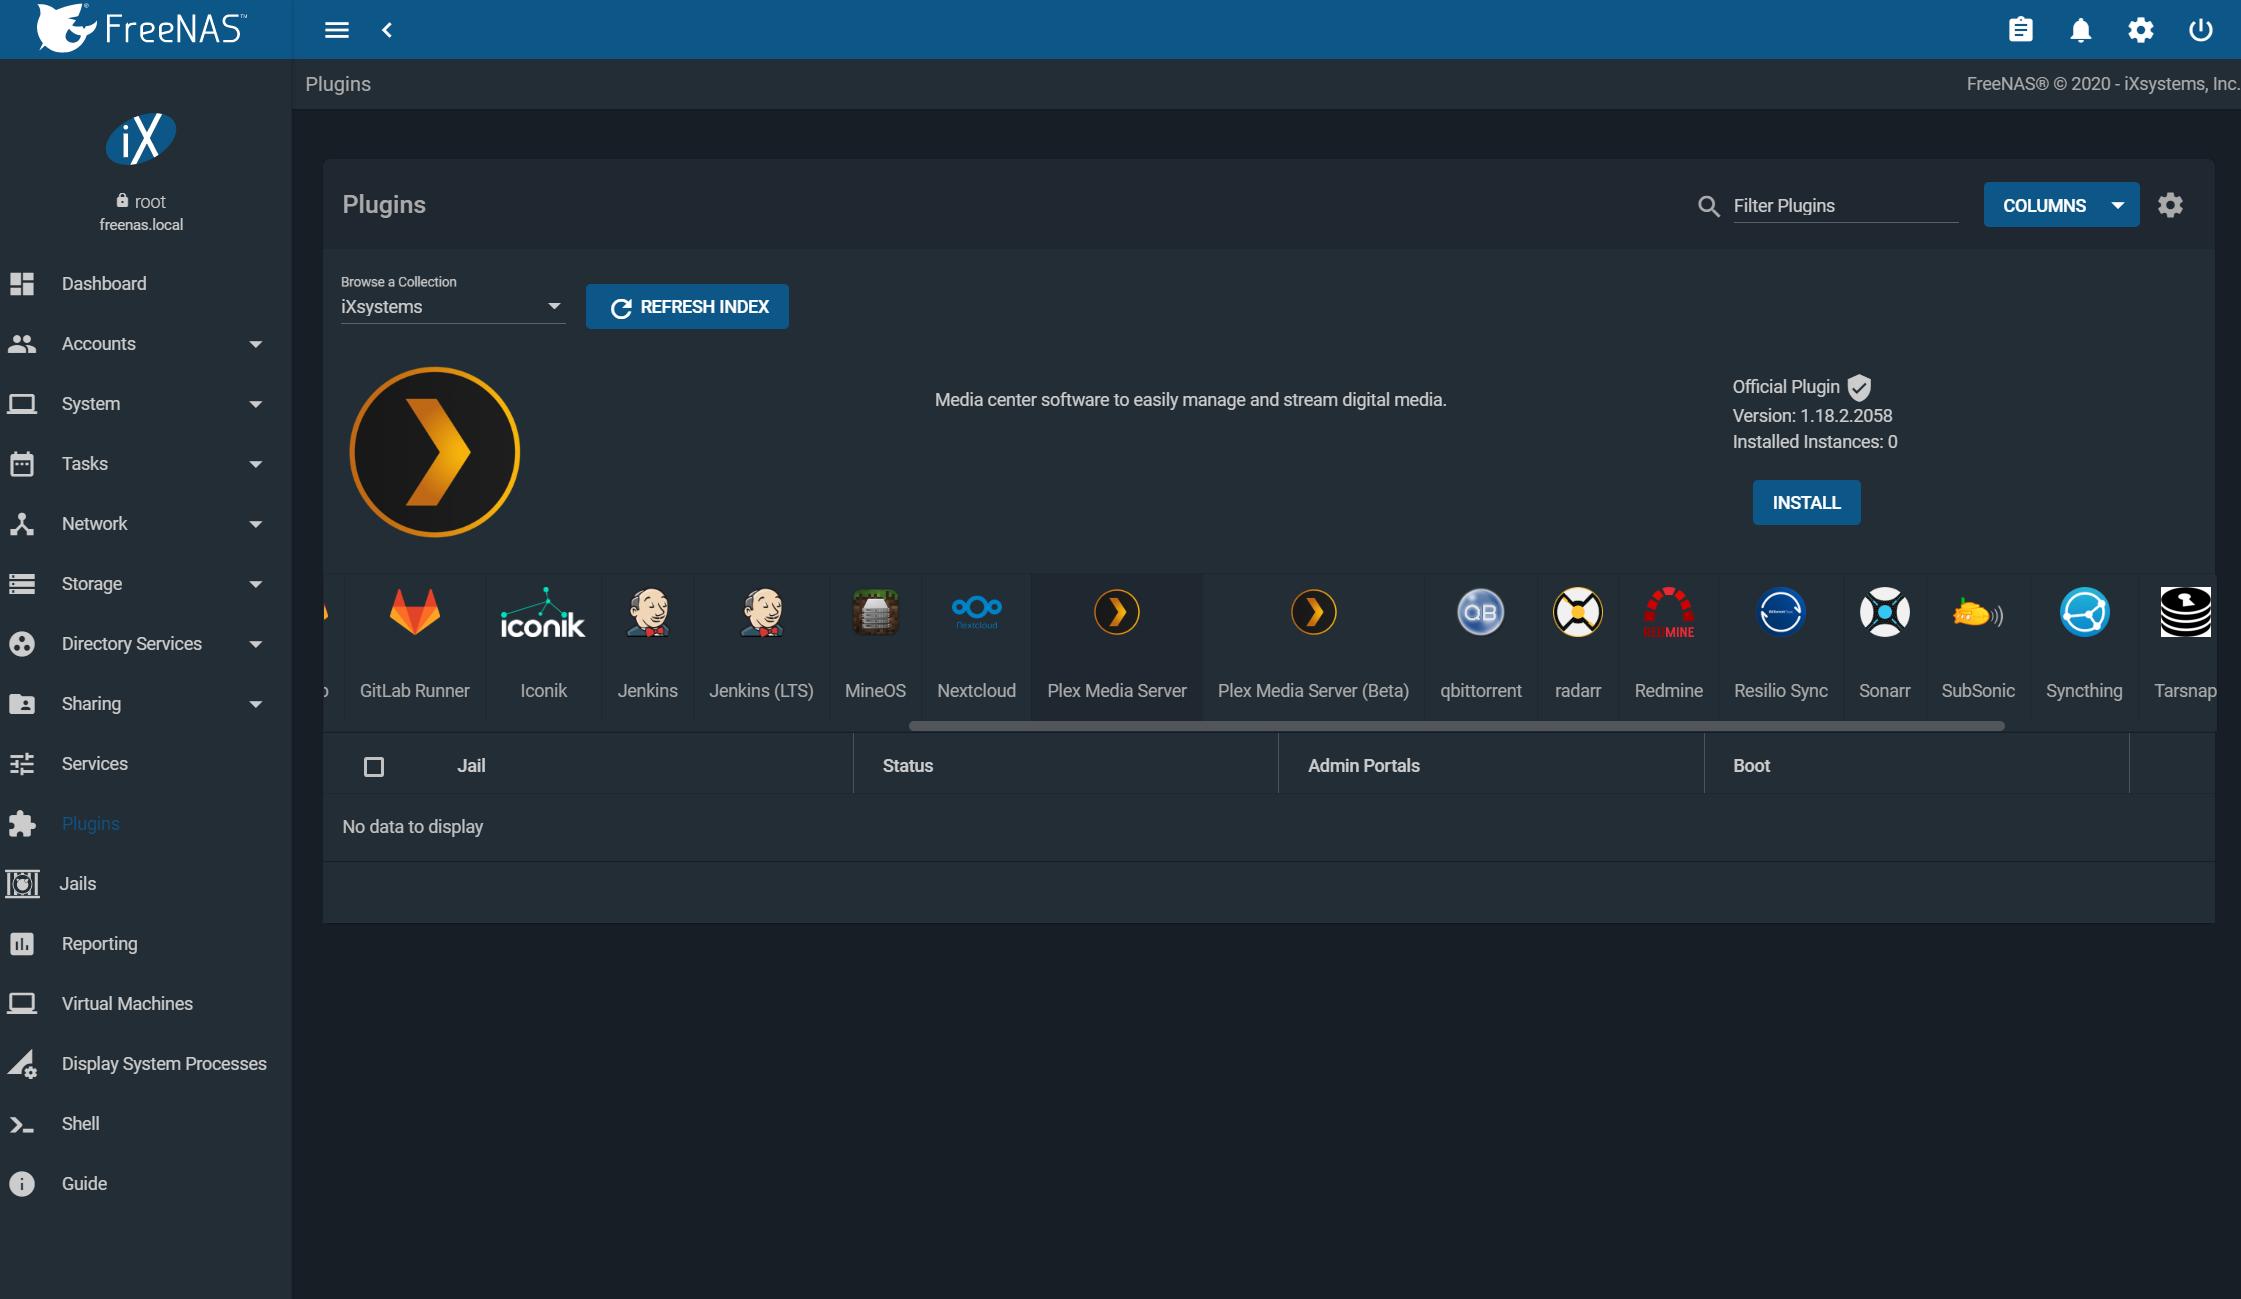 Installing Plex Media Server on FreeNAS Plex Support